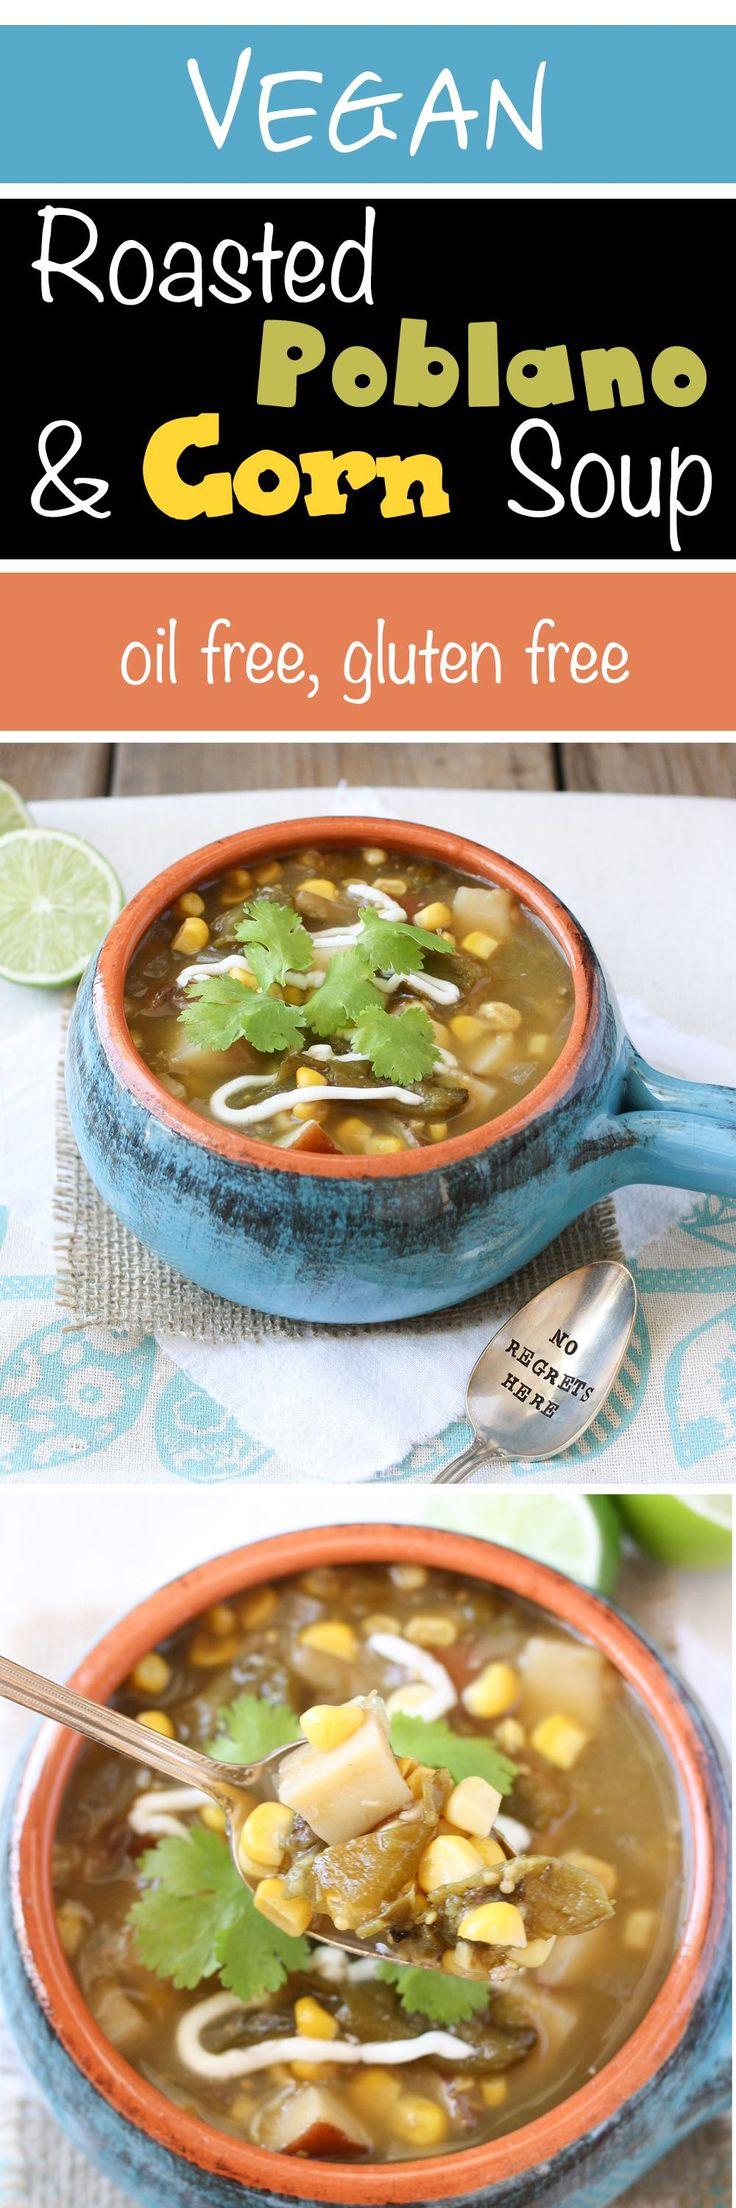 Roasted Poblano & Corn Soup | www.veggiesdontbite.com | #vegan #plantbased #glutenfree #oilfree #mexican